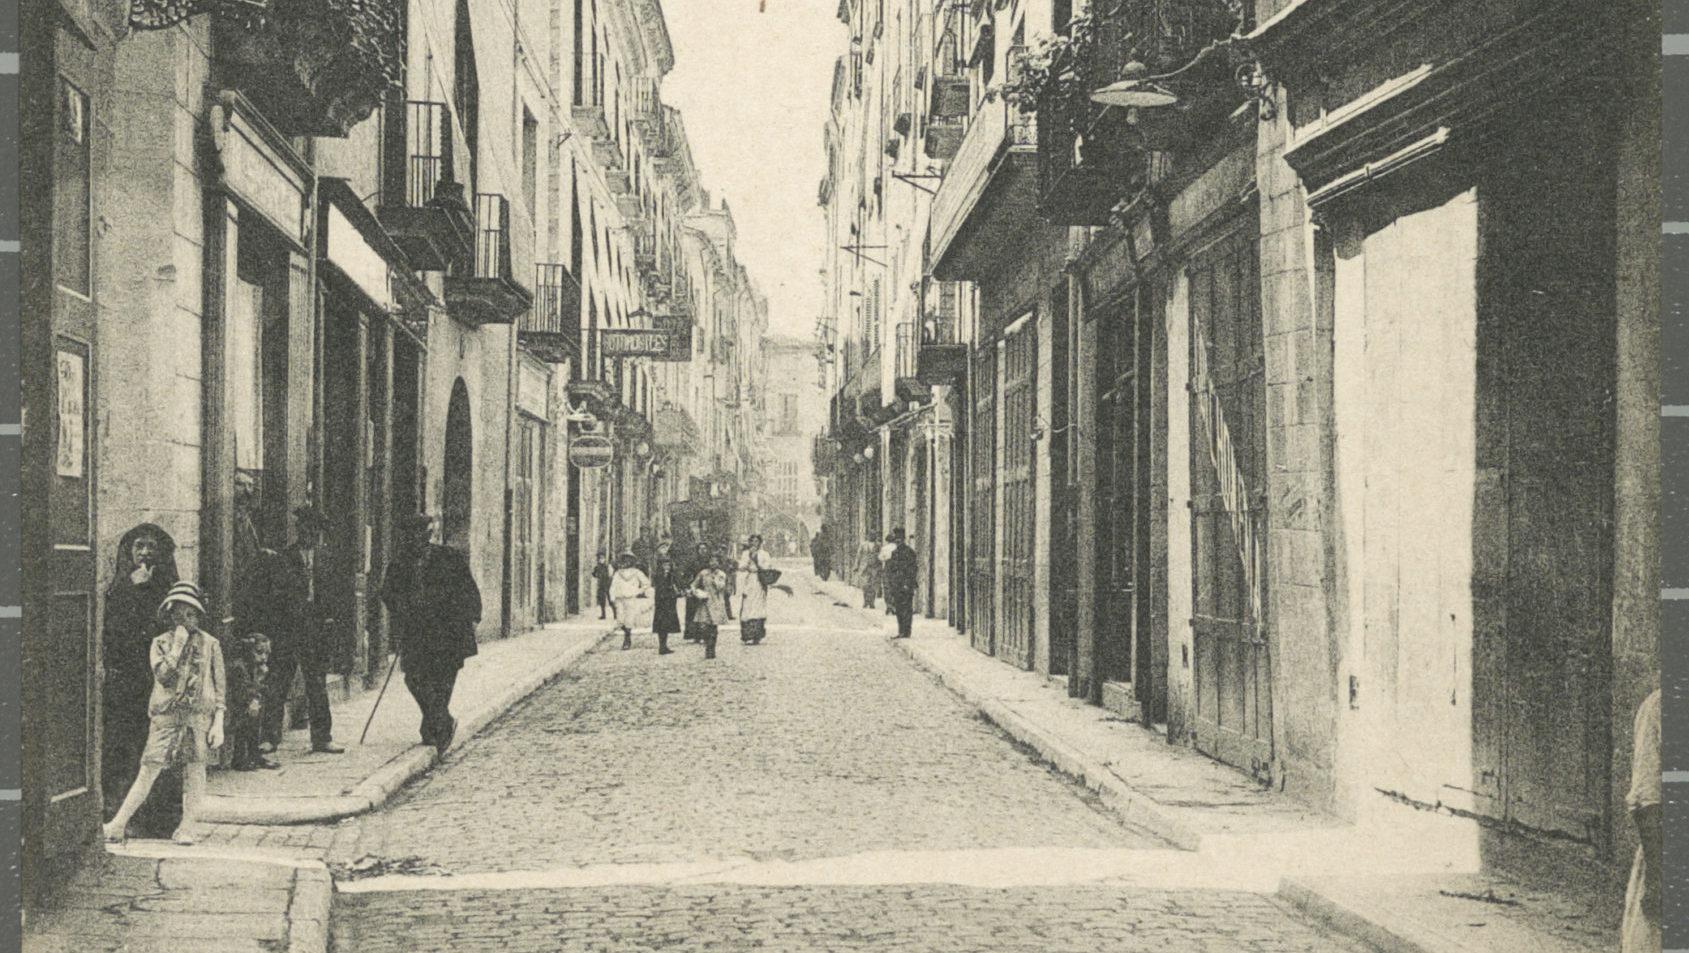 Ajuntament de Girona. CRDI (Fototípia Thomas, ed.)